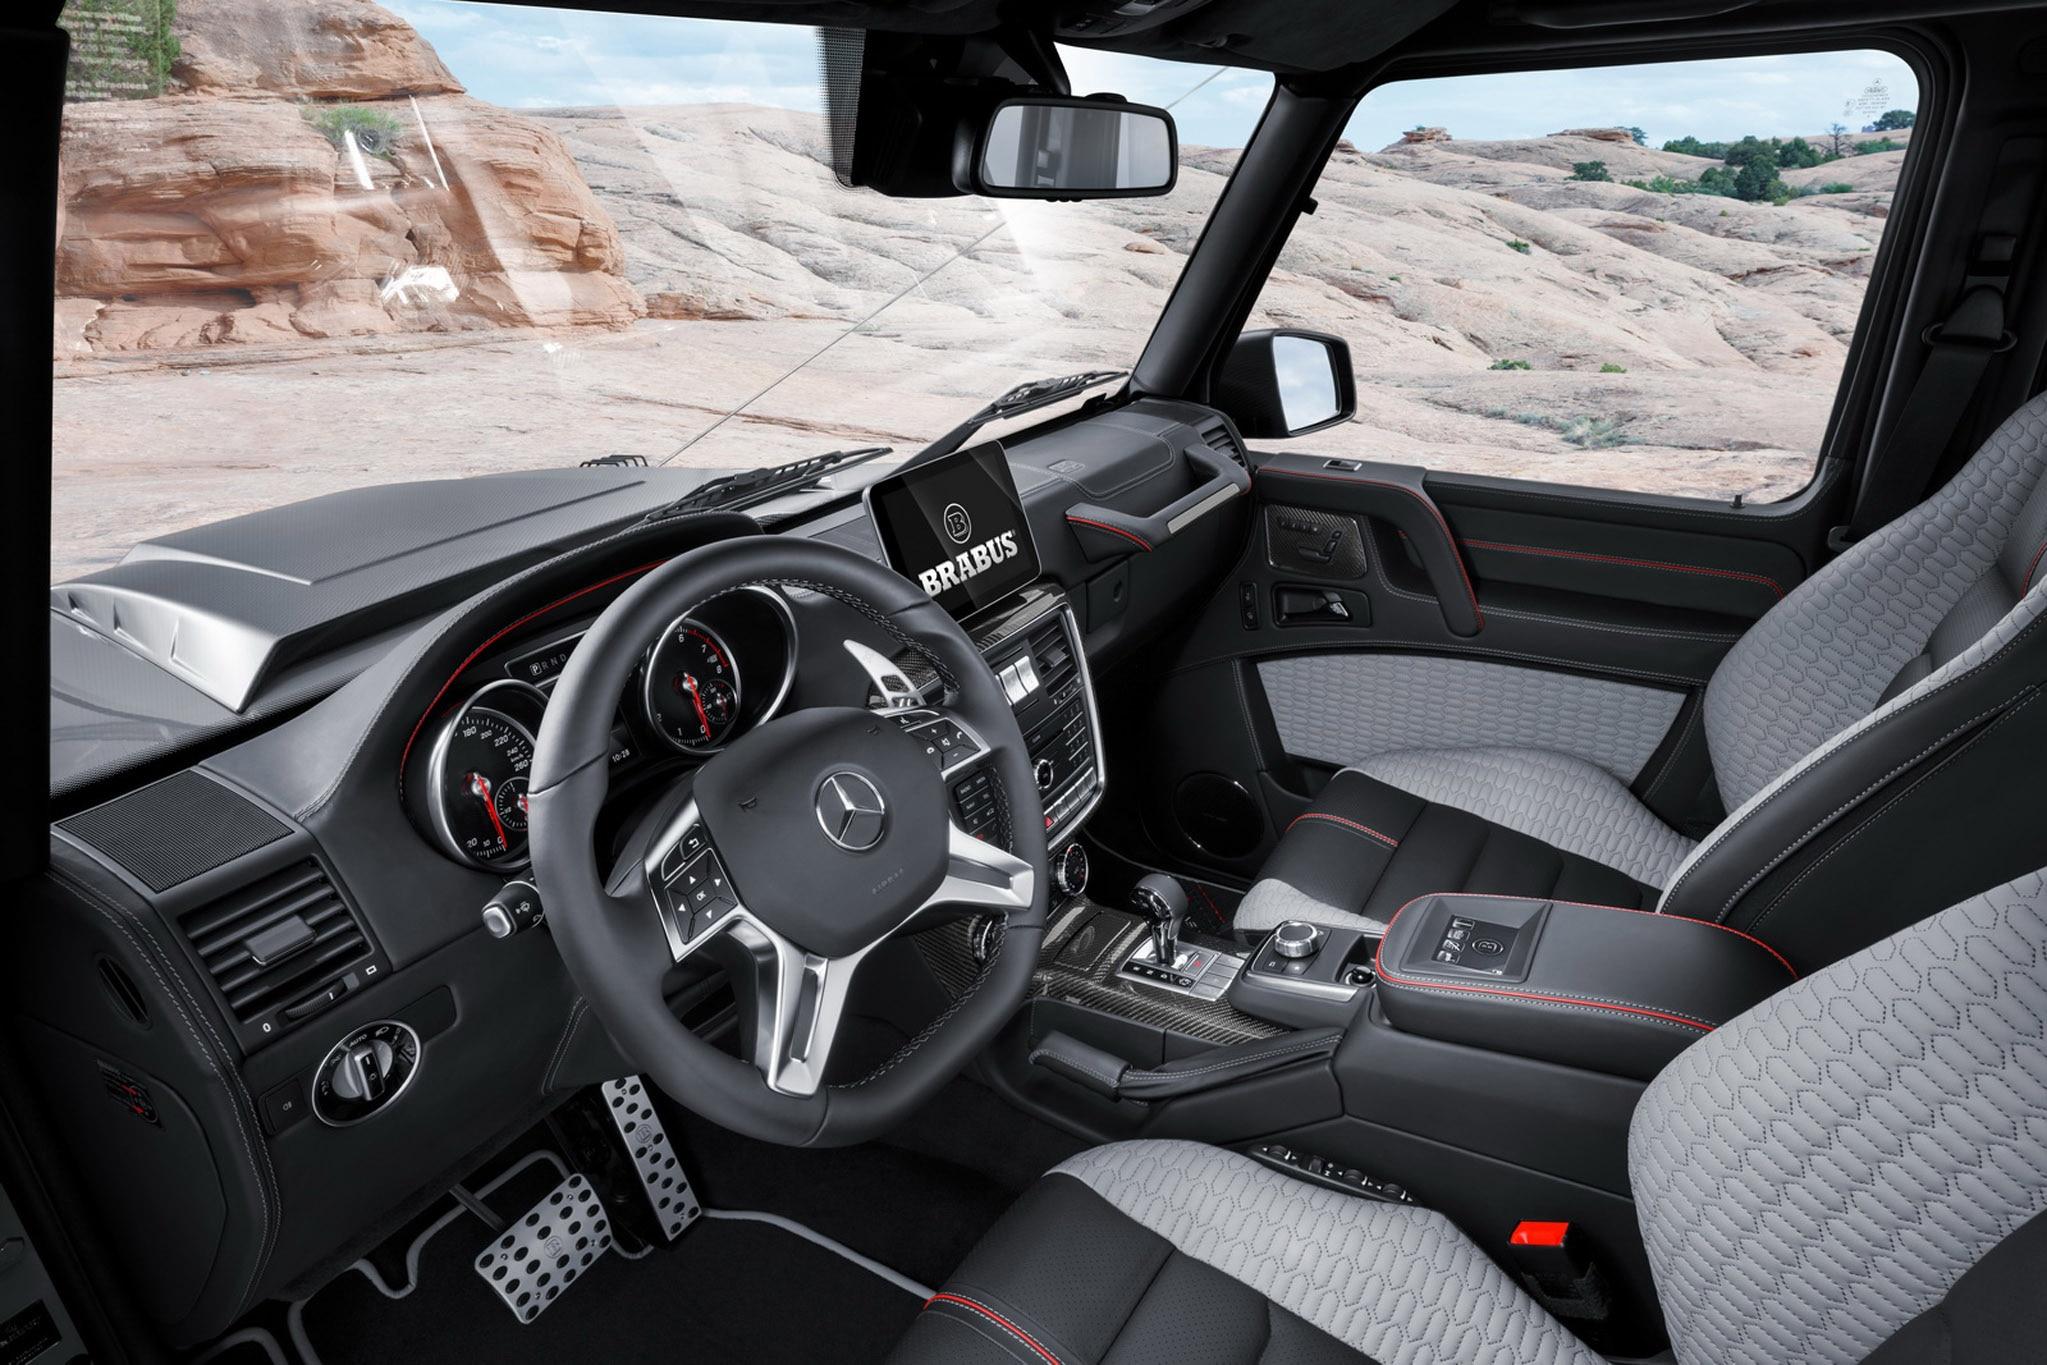 Brabus Turns Mercedes Benz G500 4x4 178 Into Adventure